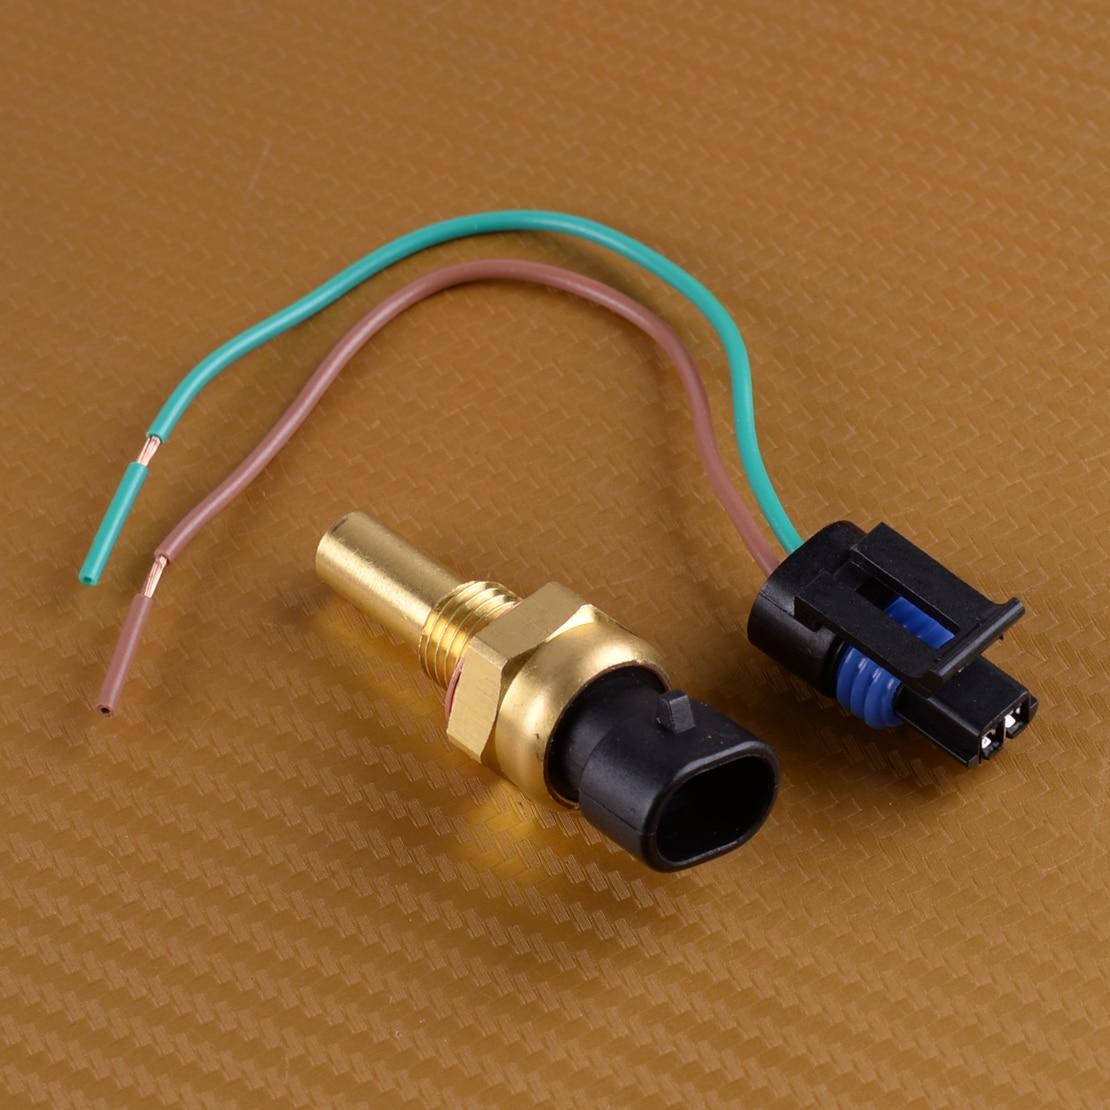 Beler Engine Coolant Temperature Sensor With Connector Fit For Buick Cadillac GMC Daewoo Isuzu Hummer Pontiac 12162193 15326388